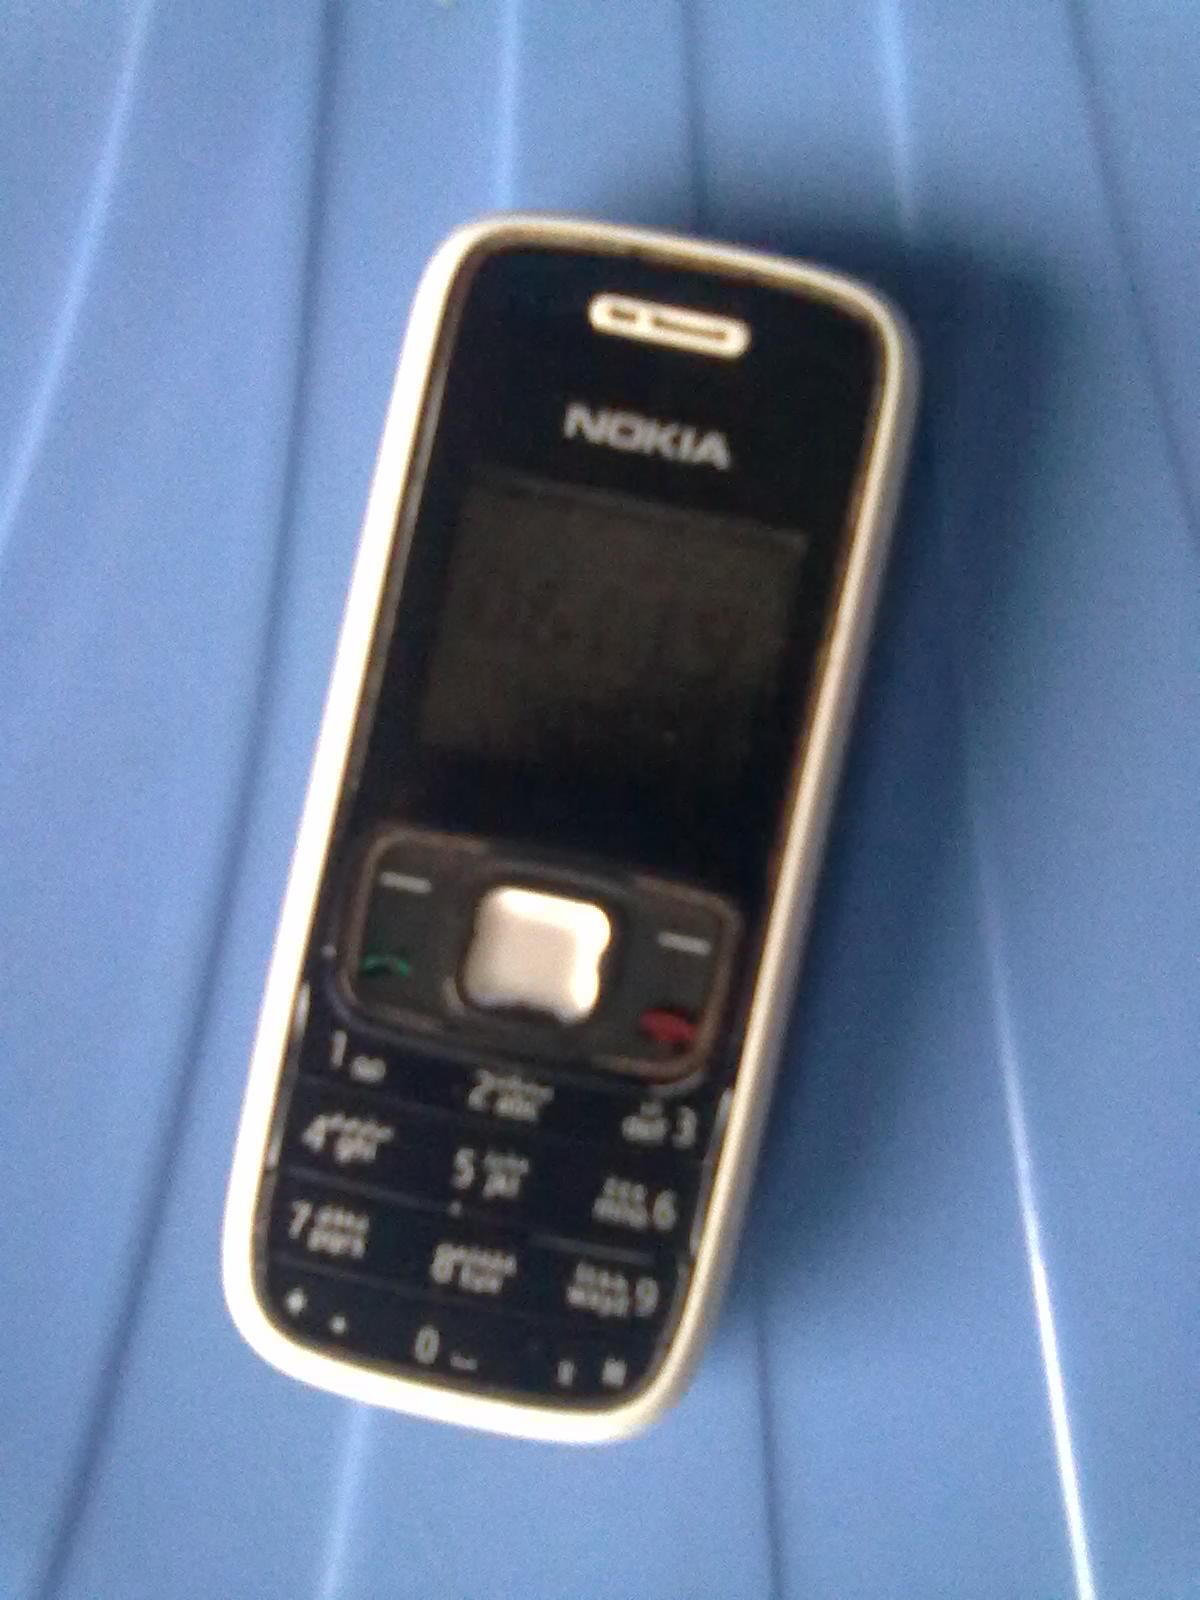 Nokia 1209 Price Nokia 1209 Color Mobil...